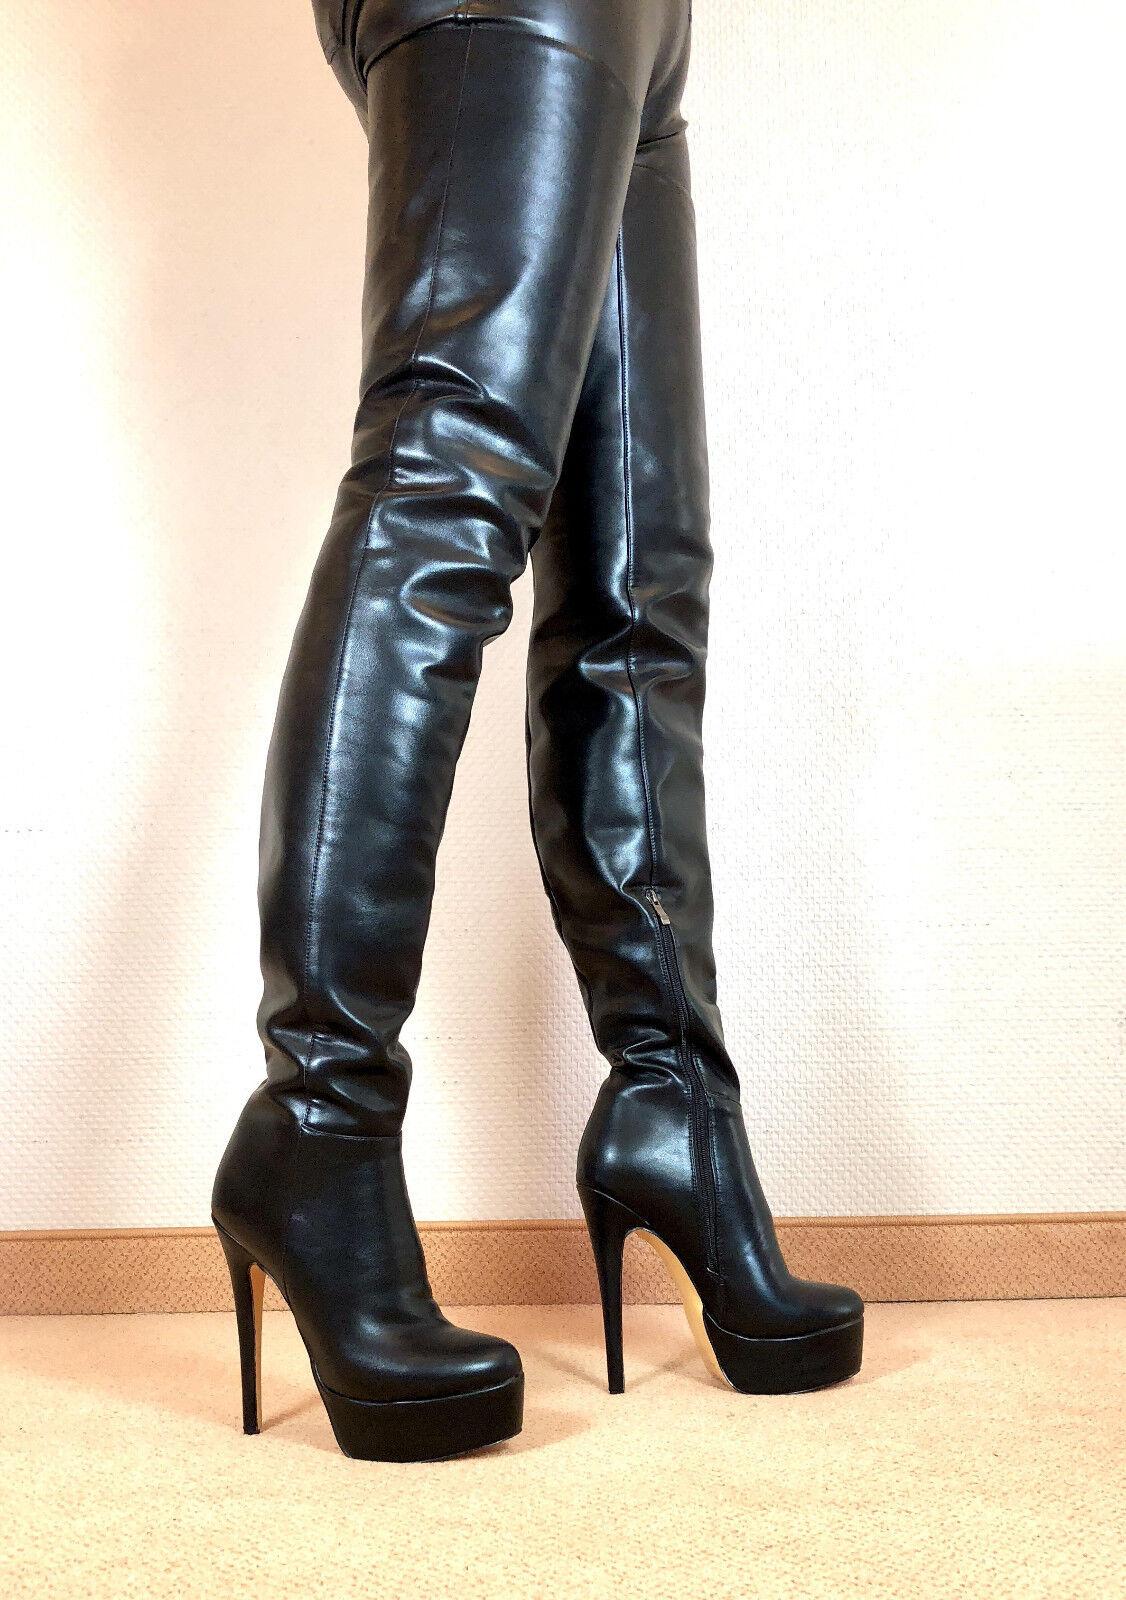 Grandes zapatos con descuento Gr.43 TOP ! Exklusiv Sexy Damen Schuhe Overknee Stiletto Stiefel Männer Boots E9